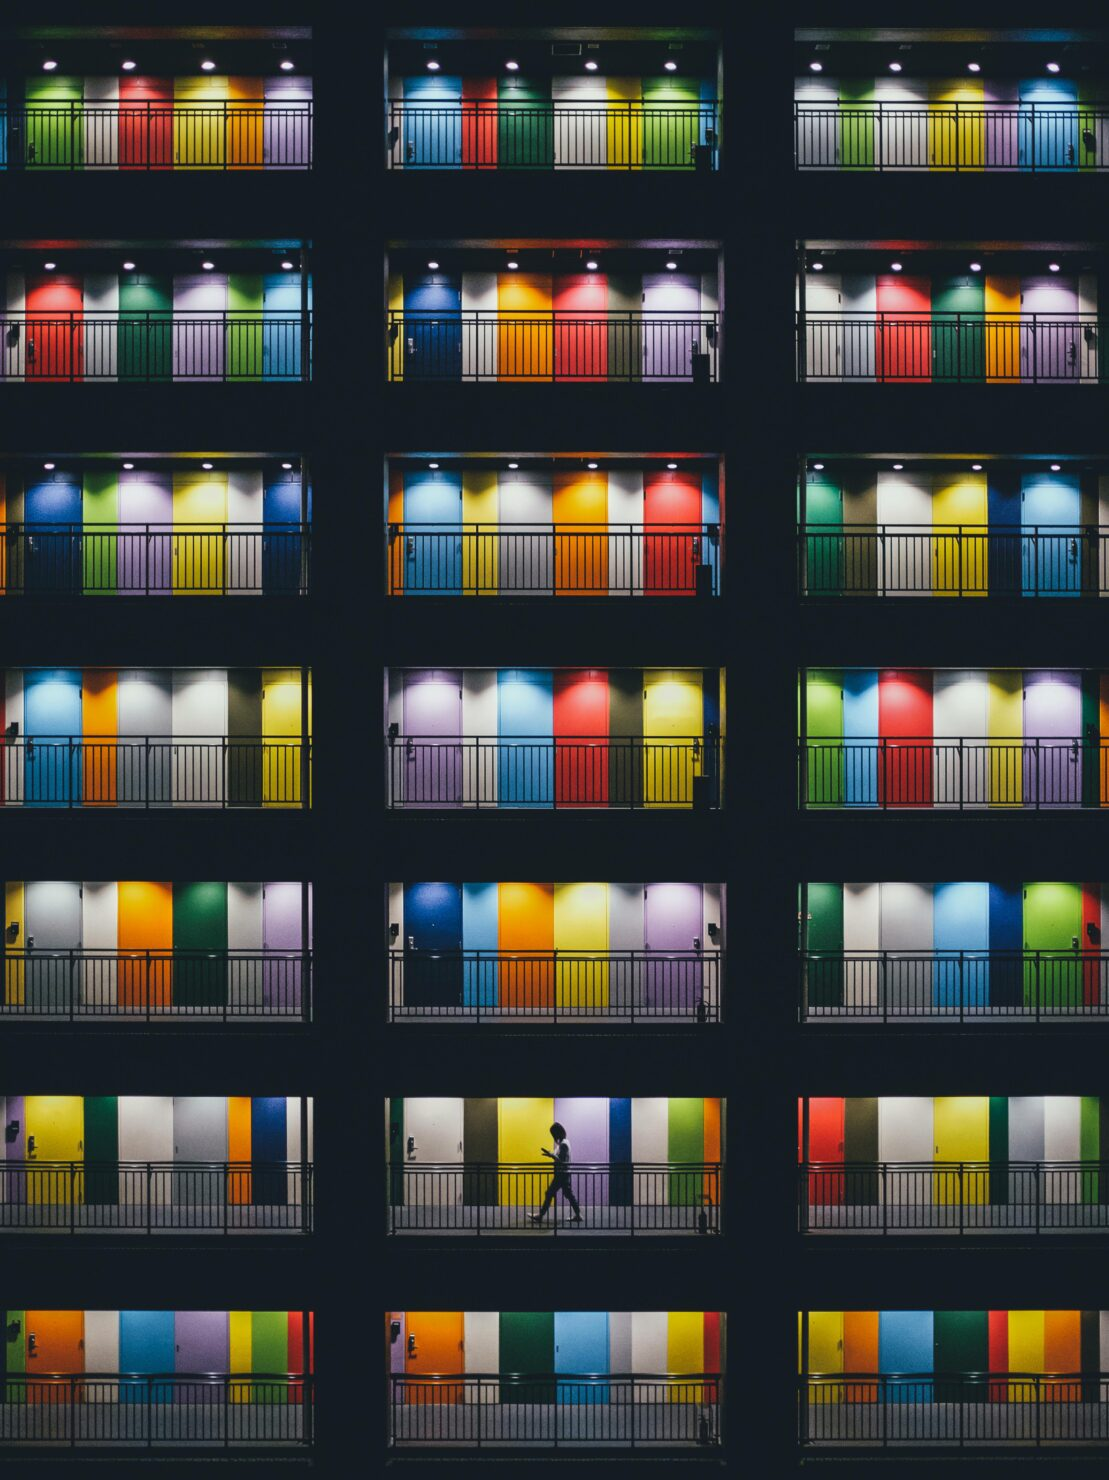 ipad-pro-5k-wallpaper-gallery-21